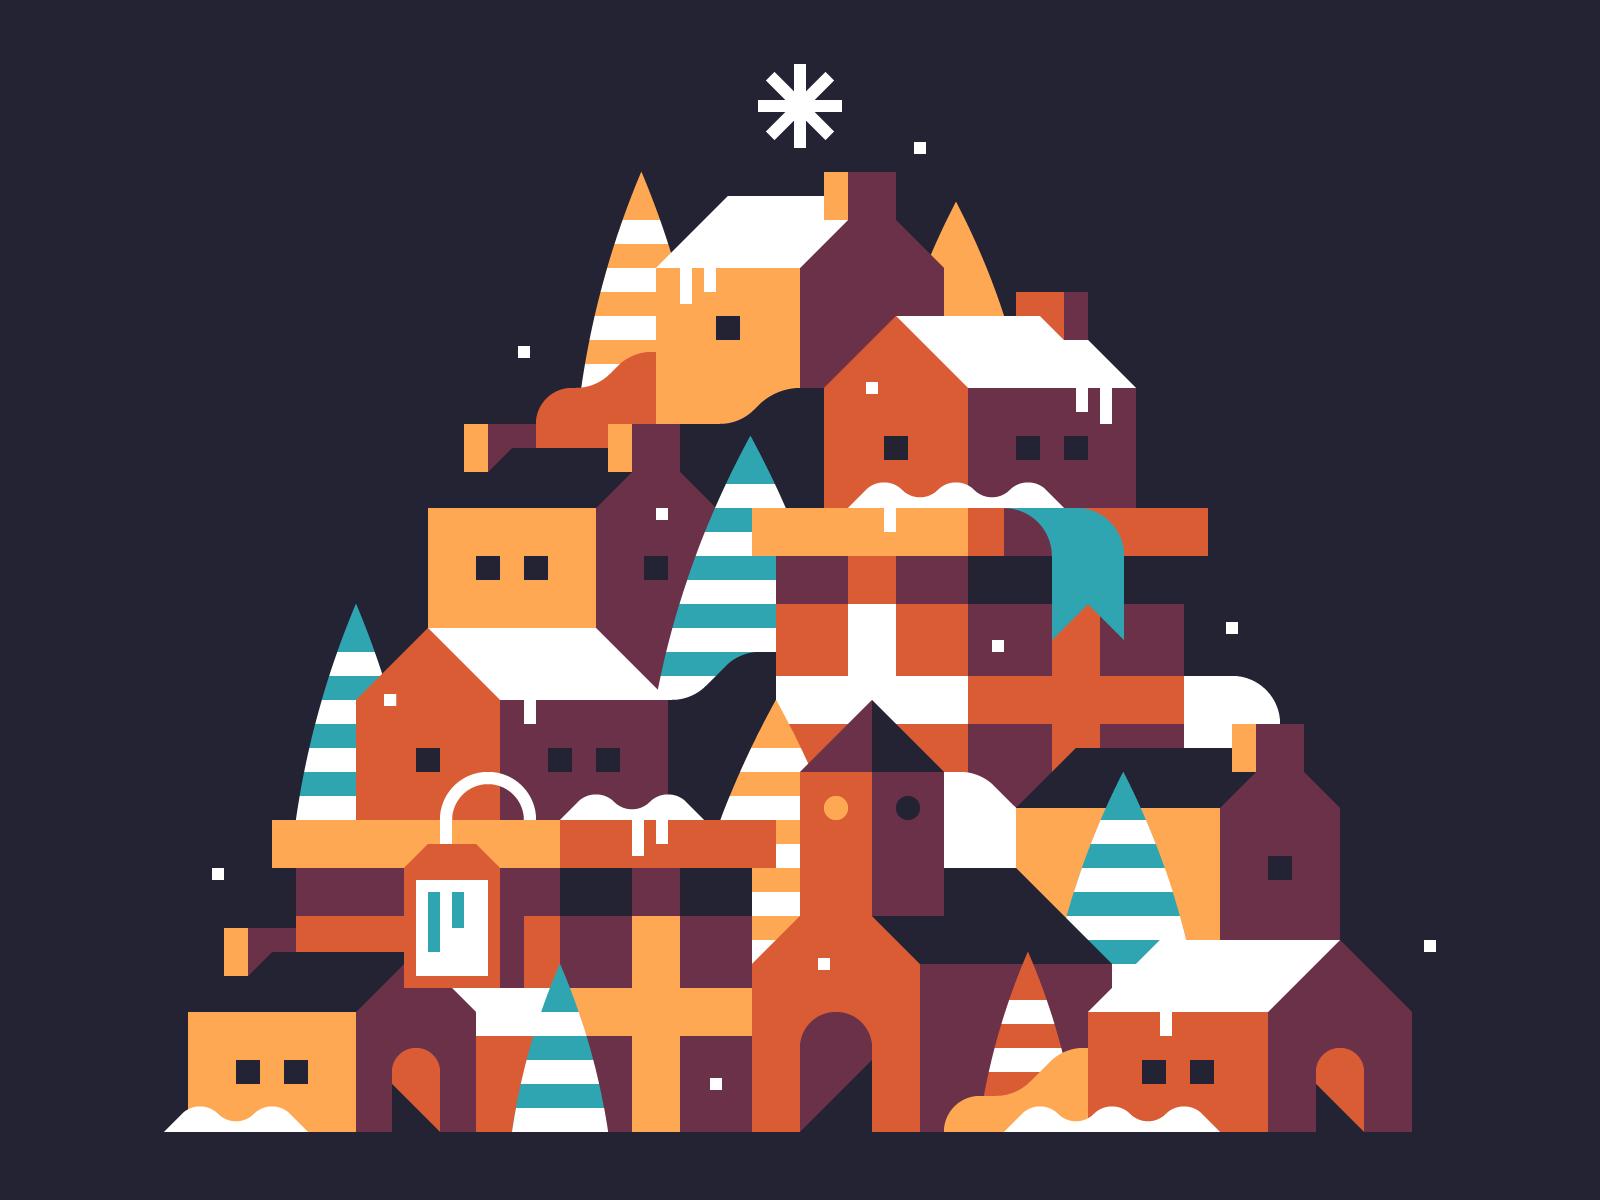 2018-christmas-card-dribbble-alex-pasquarella_4x.png